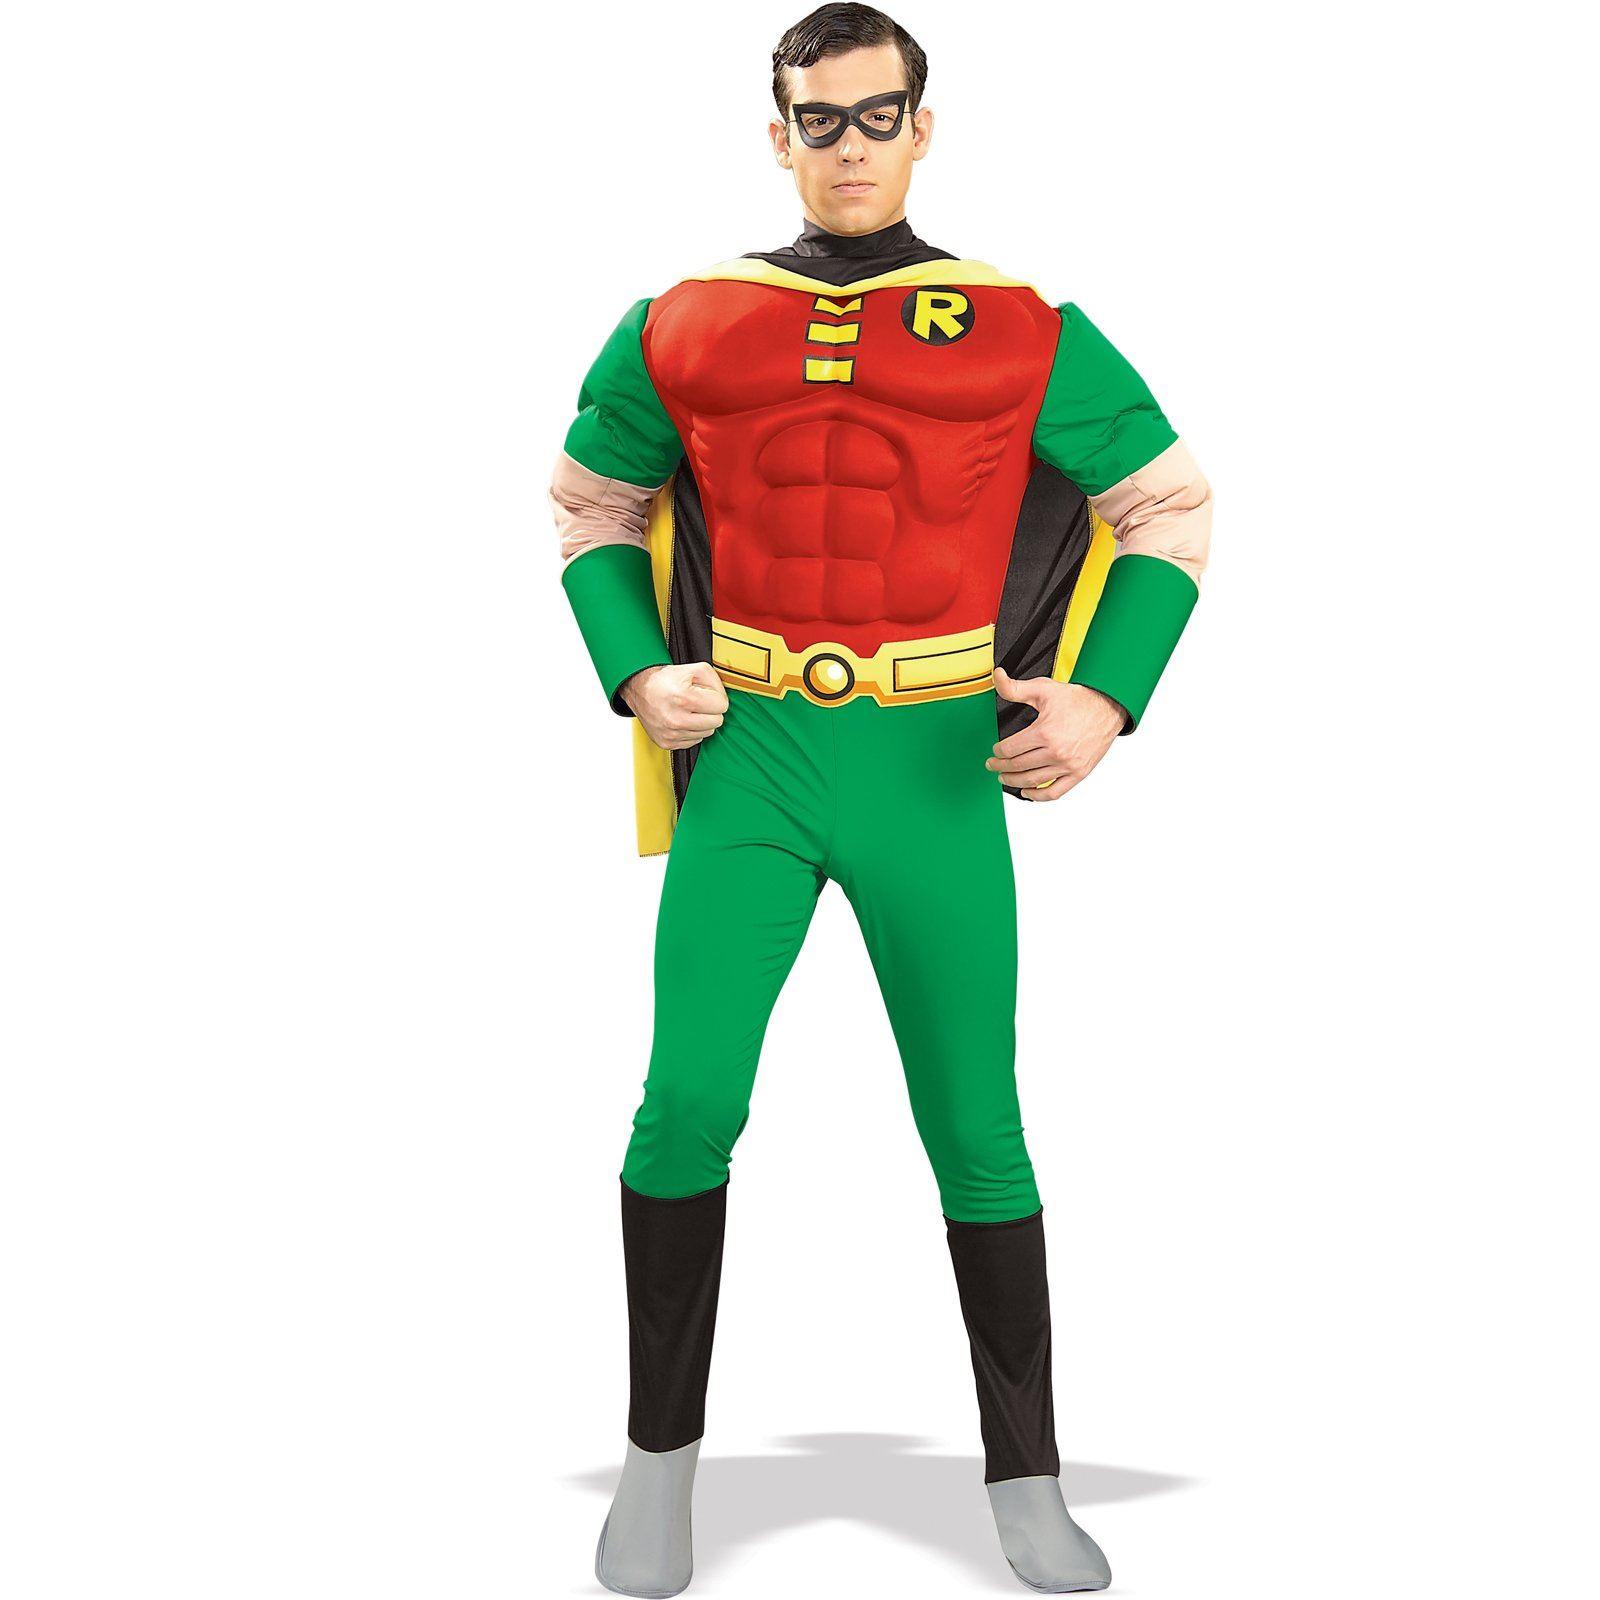 Adult Comic Robin Hood Deluxe Muscle Super Hero Men Costume  sc 1 st  The Costume Land & Adult Comic Robin Hood Deluxe Muscle Super Hero Men Costume | $45.99 ...